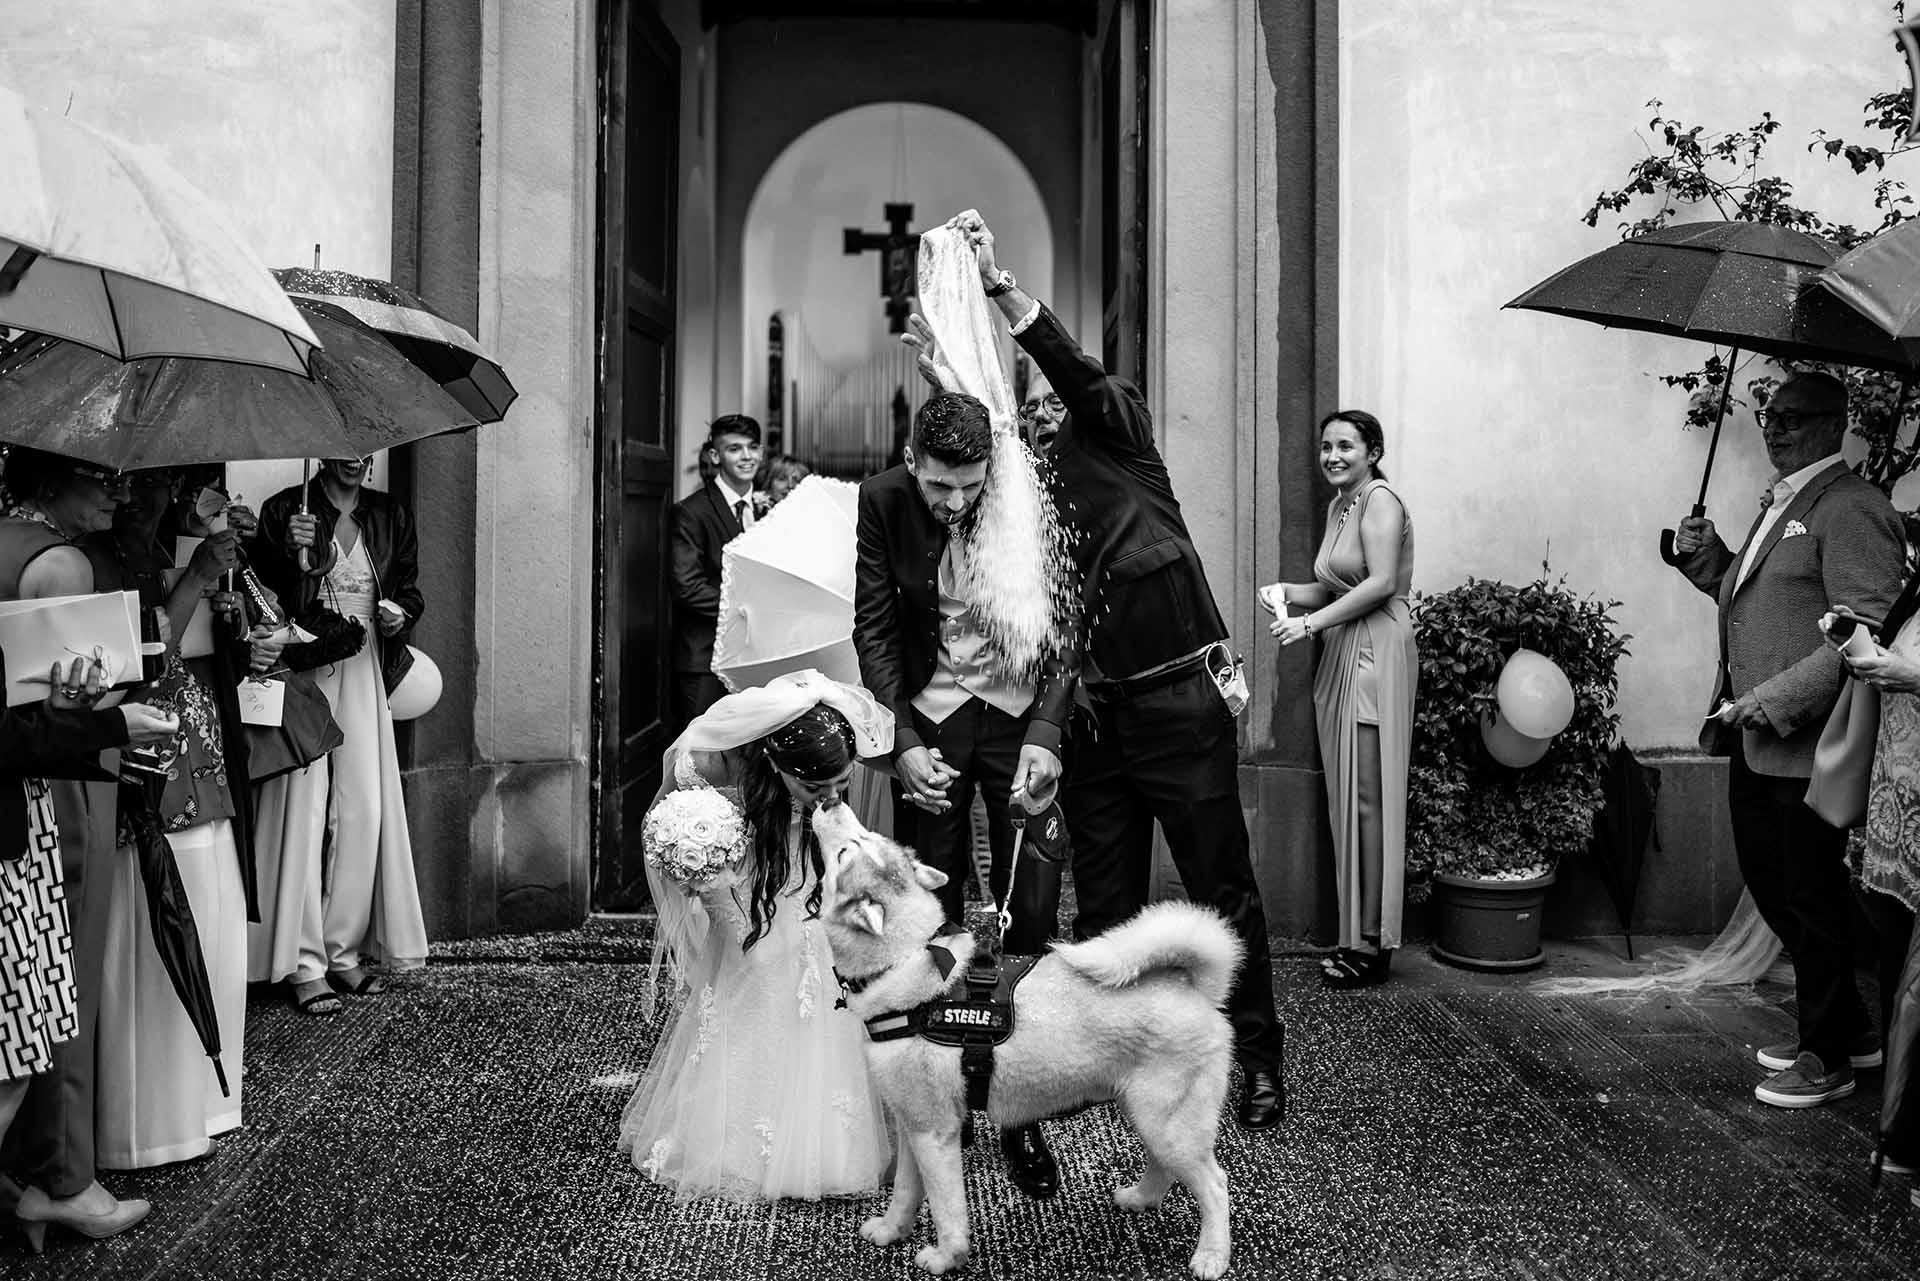 Massa-Carrara的Alessandro Colle是montespertoli的婚礼摄影师